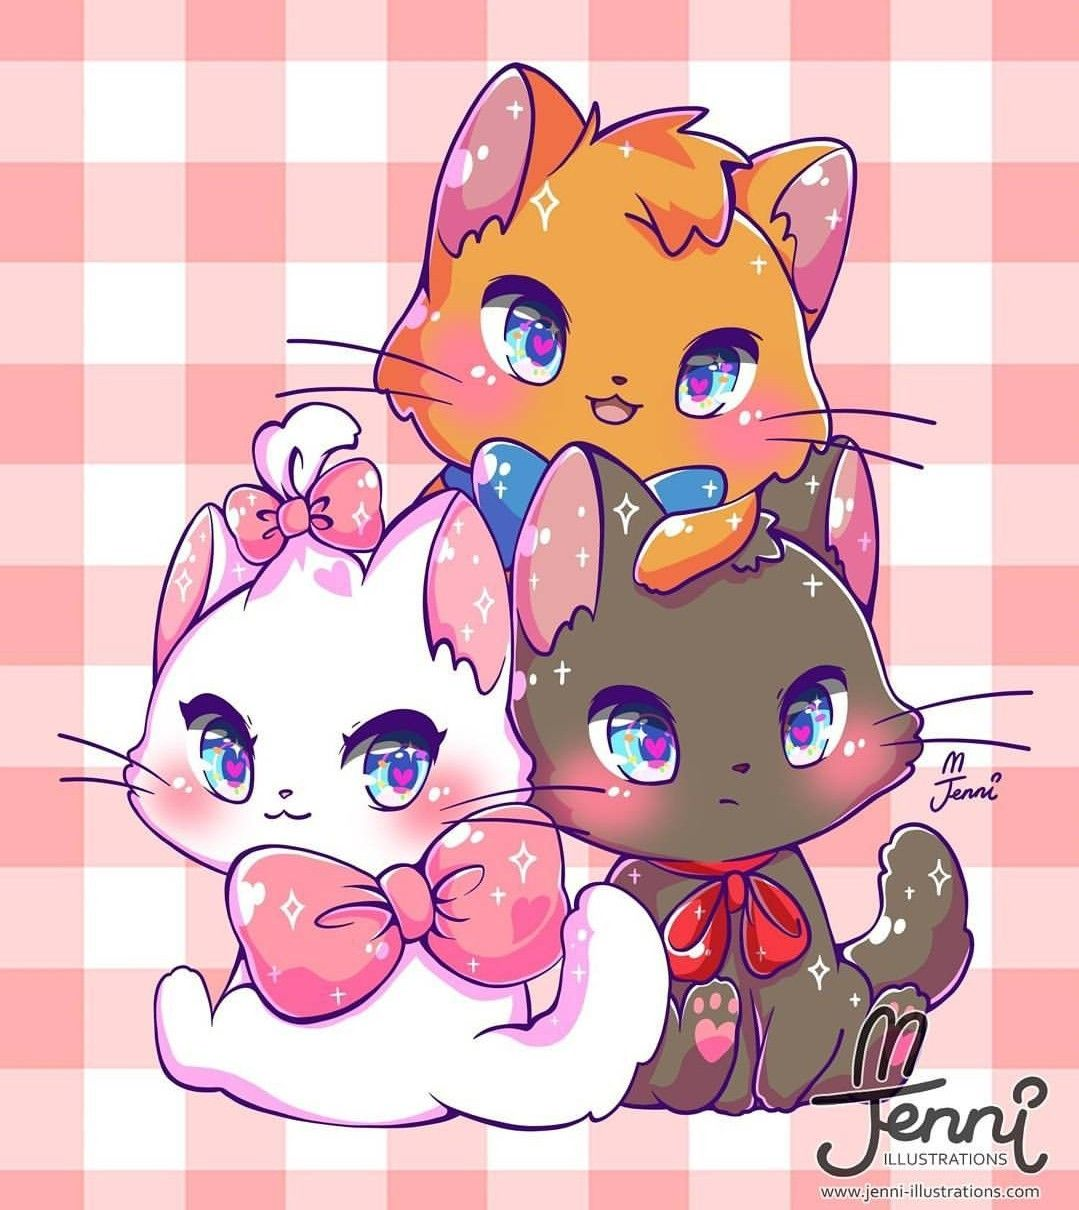 Pin by Lacey Mahan on Art Cute cat drawing, Kawaii chibi